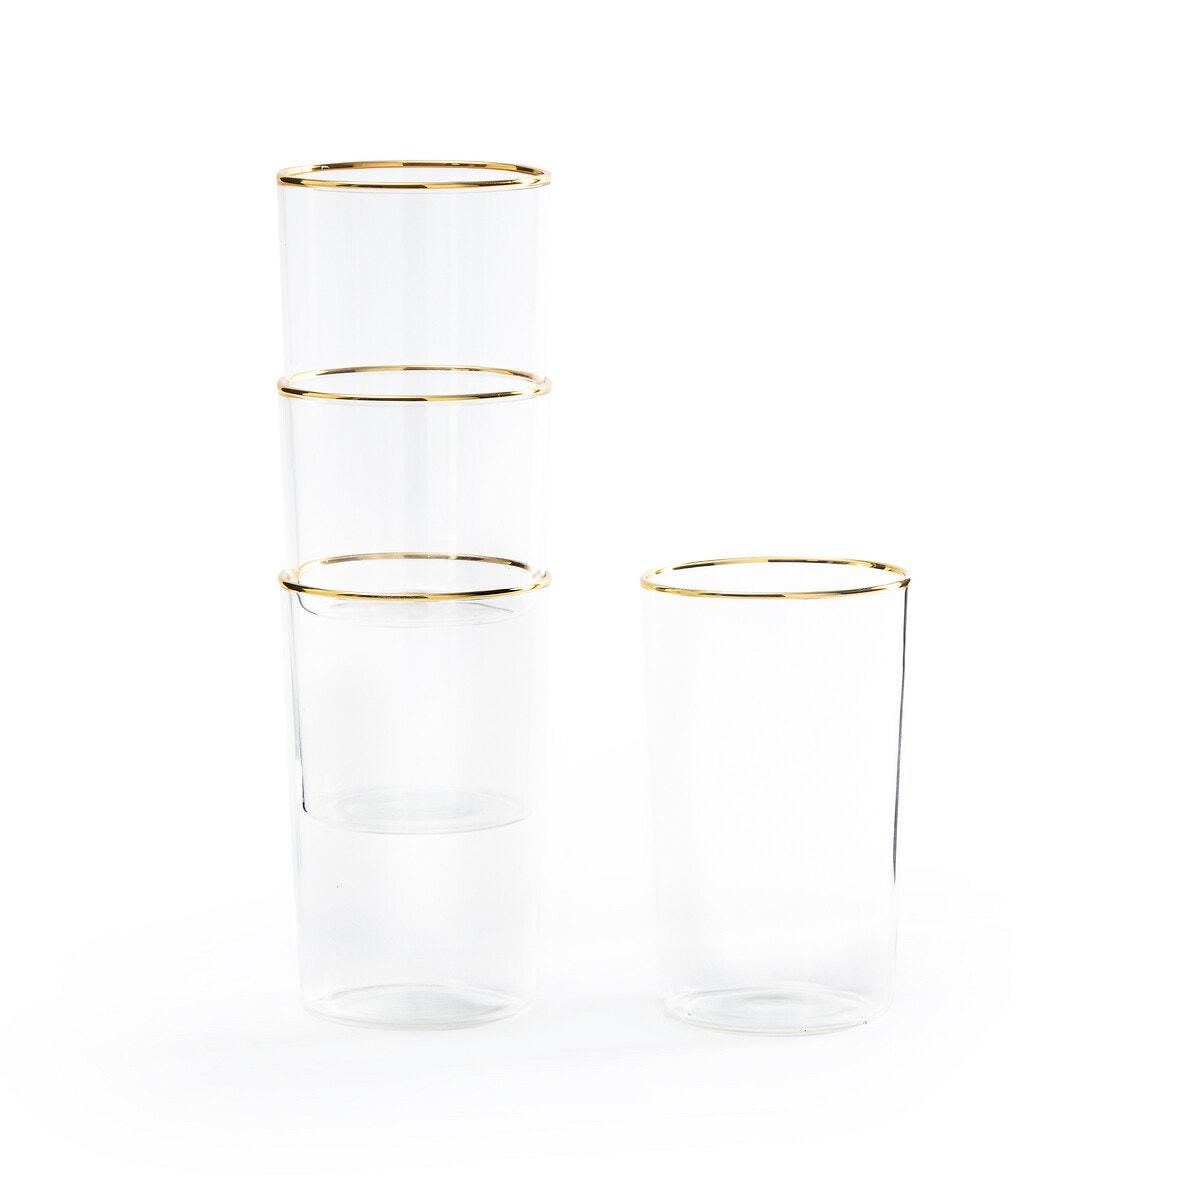 4 vasos con filo dorado